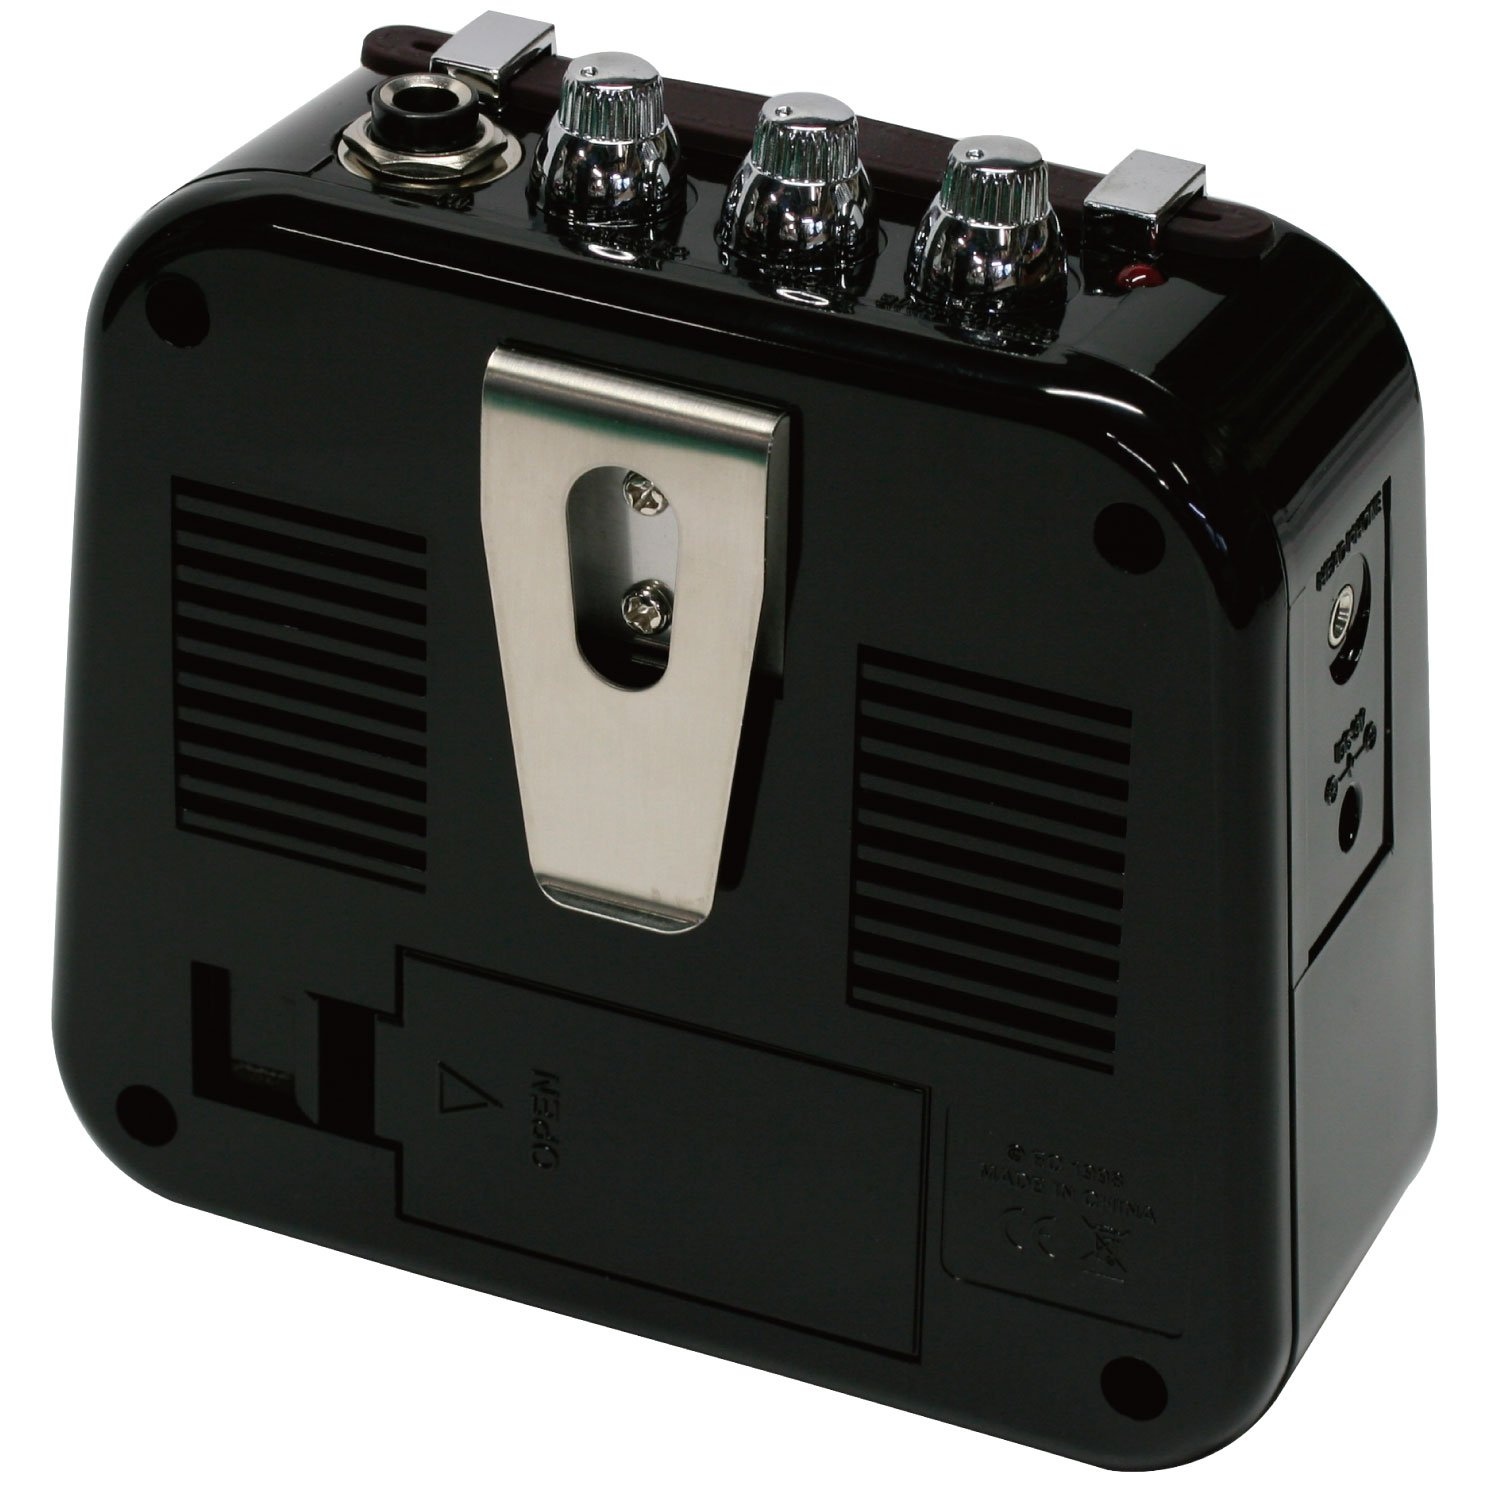 Danelectro Honeytone N-10 Guitar Mini Amp, Black with belt clip by Danelectro (Image #2)